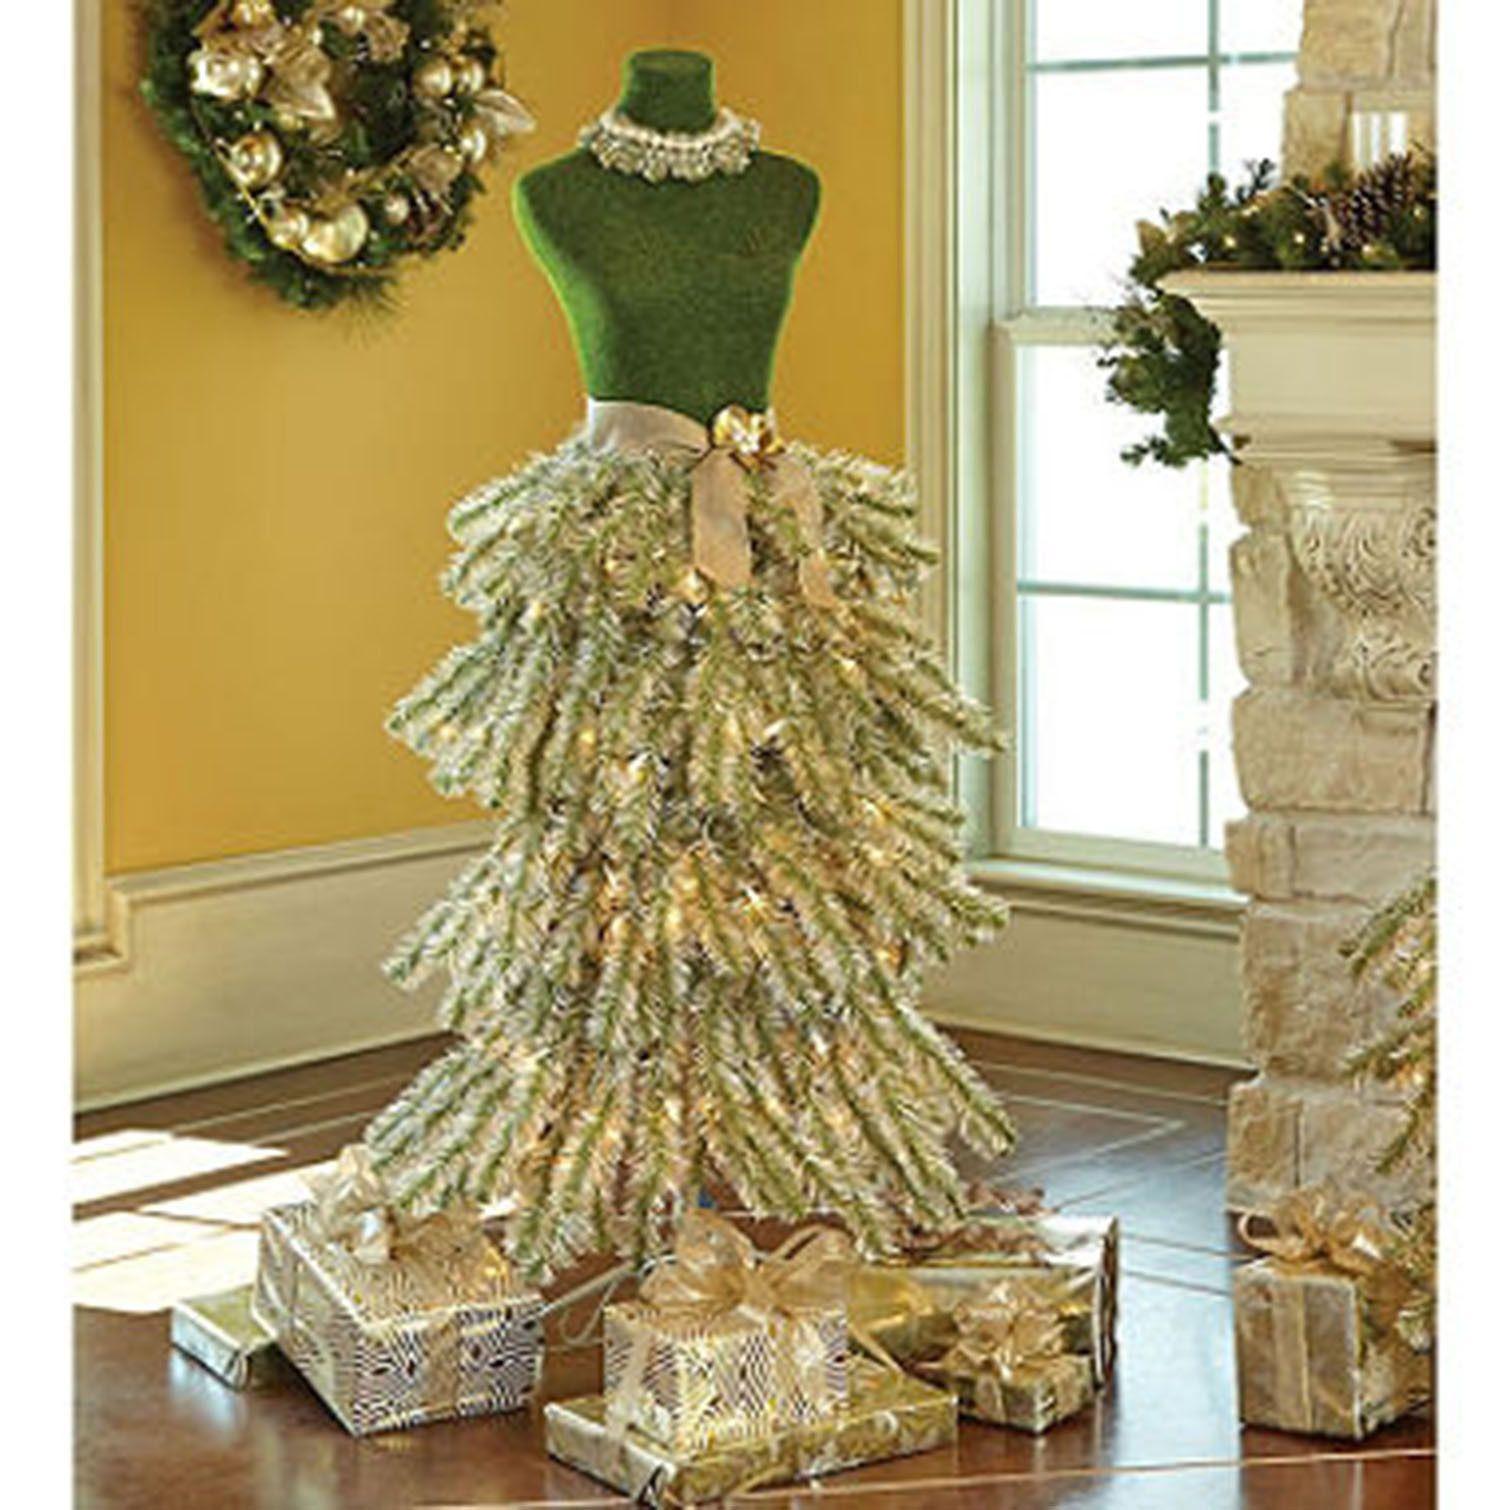 Sams Christmas Trees: CHRISTMAS TREE Boutique Decor Dress From Pine Home Holiday